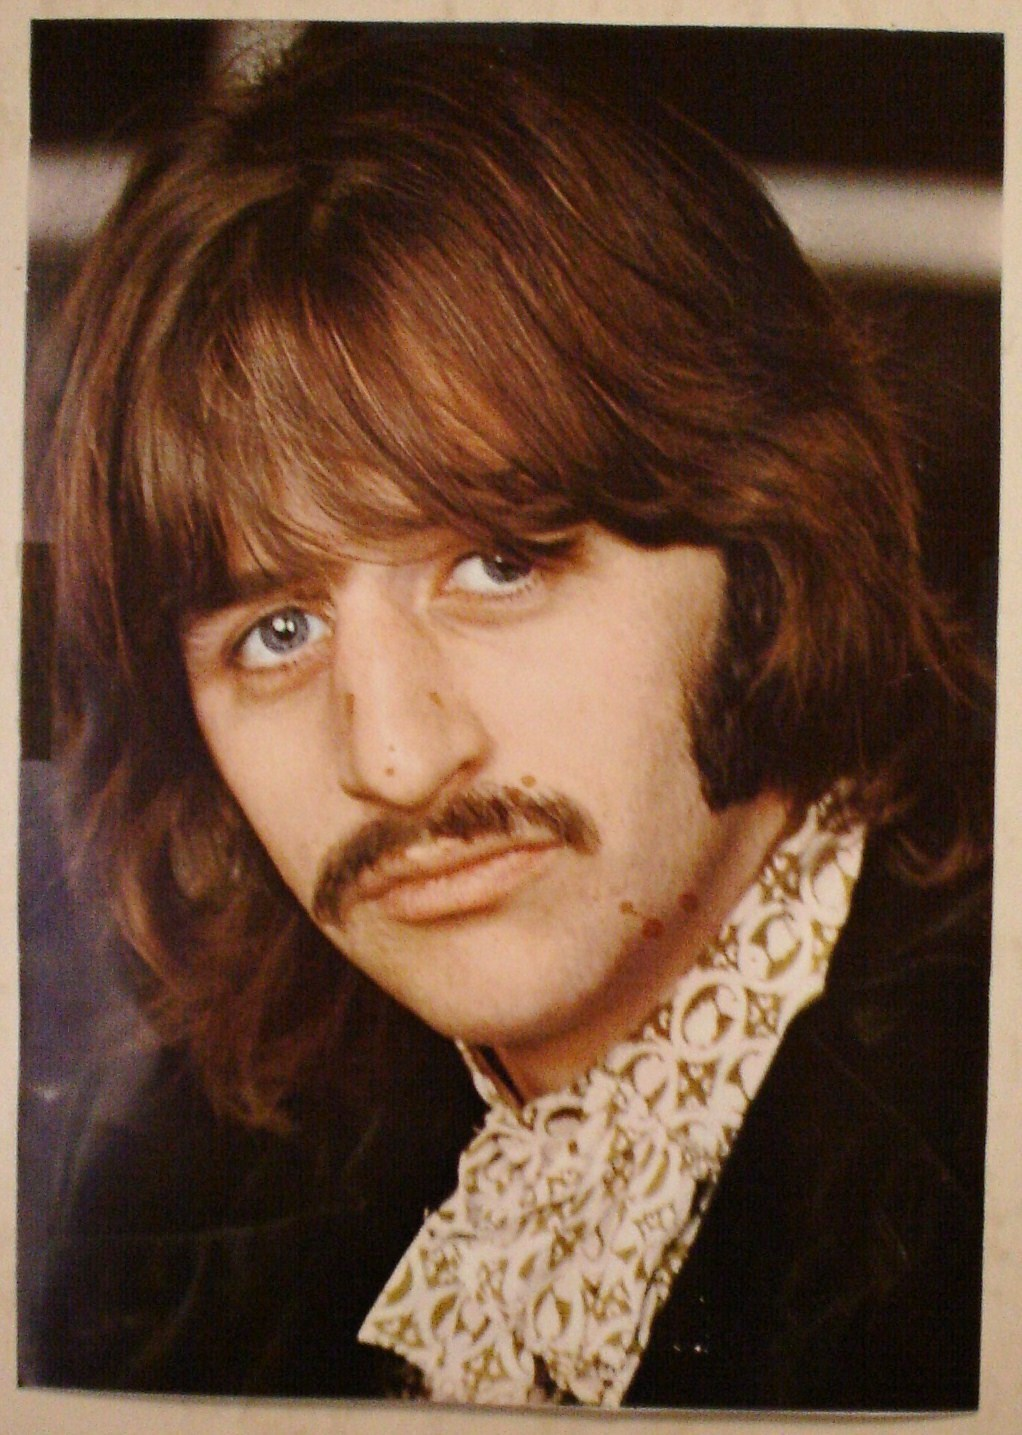 The Beatles the white album - the-white-album-the-beatles-2488772-1022-1435